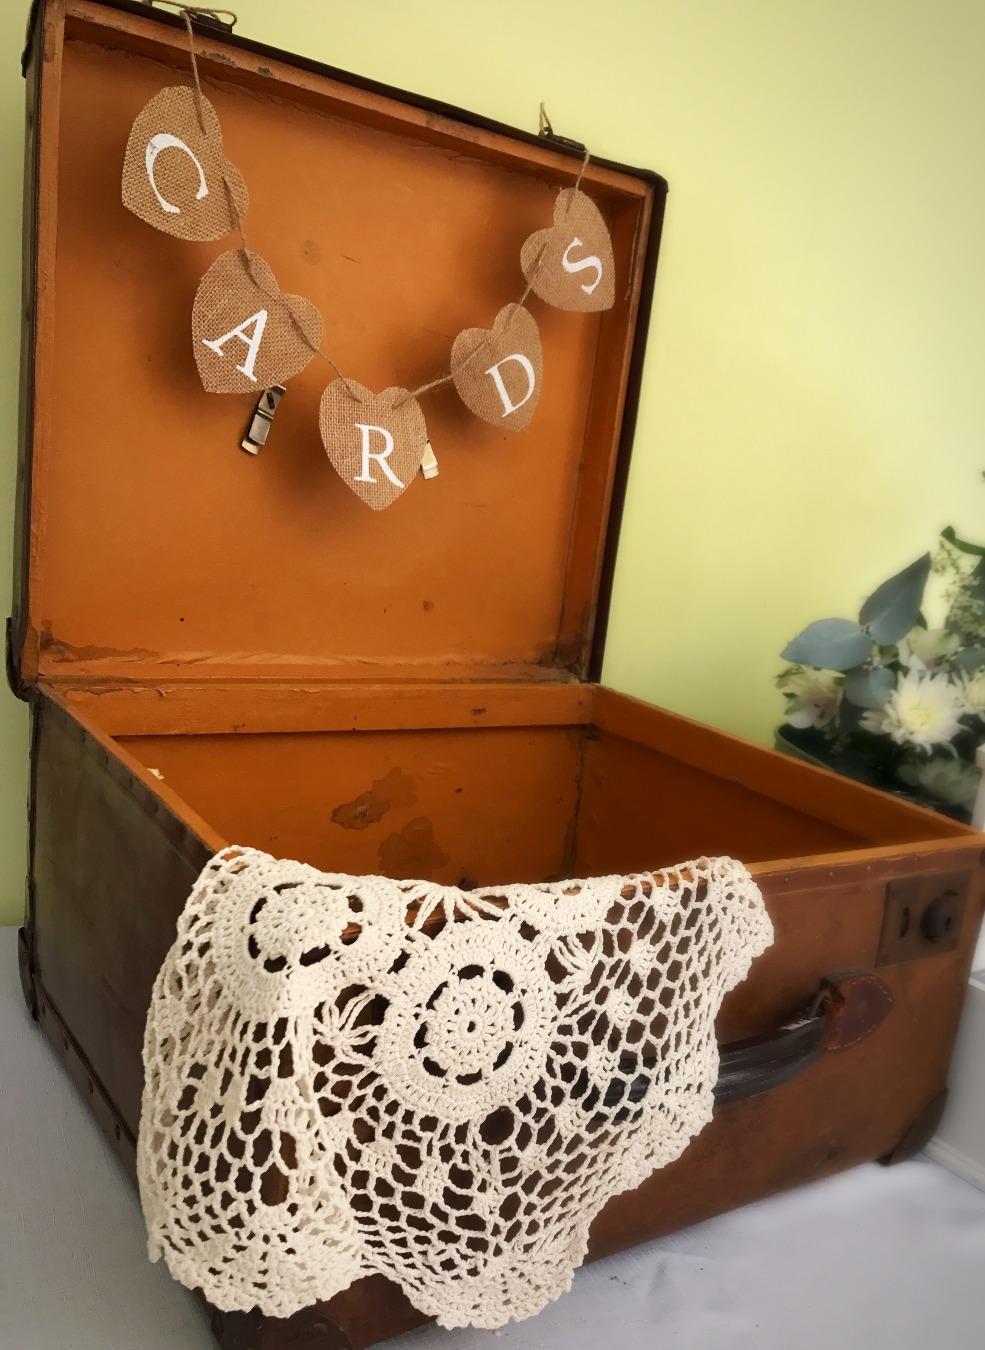 Vintage Suitcase Wishing Well